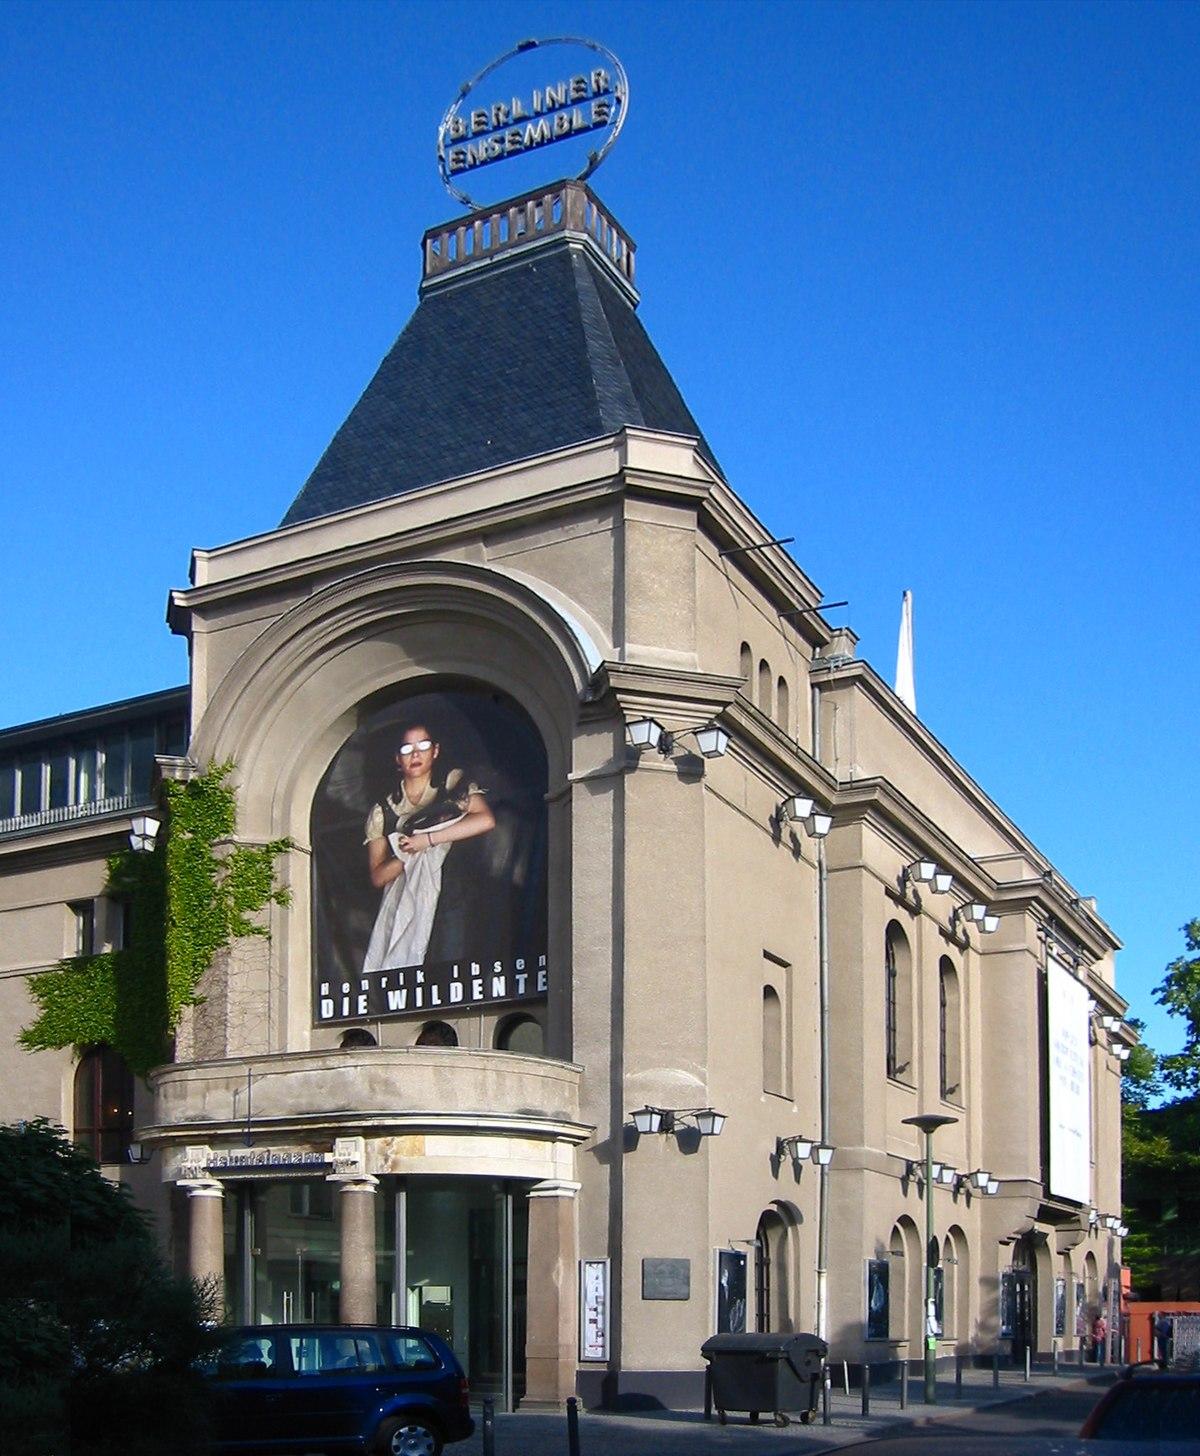 Theater Am Schiffbauerdamm Wikimedia Commons